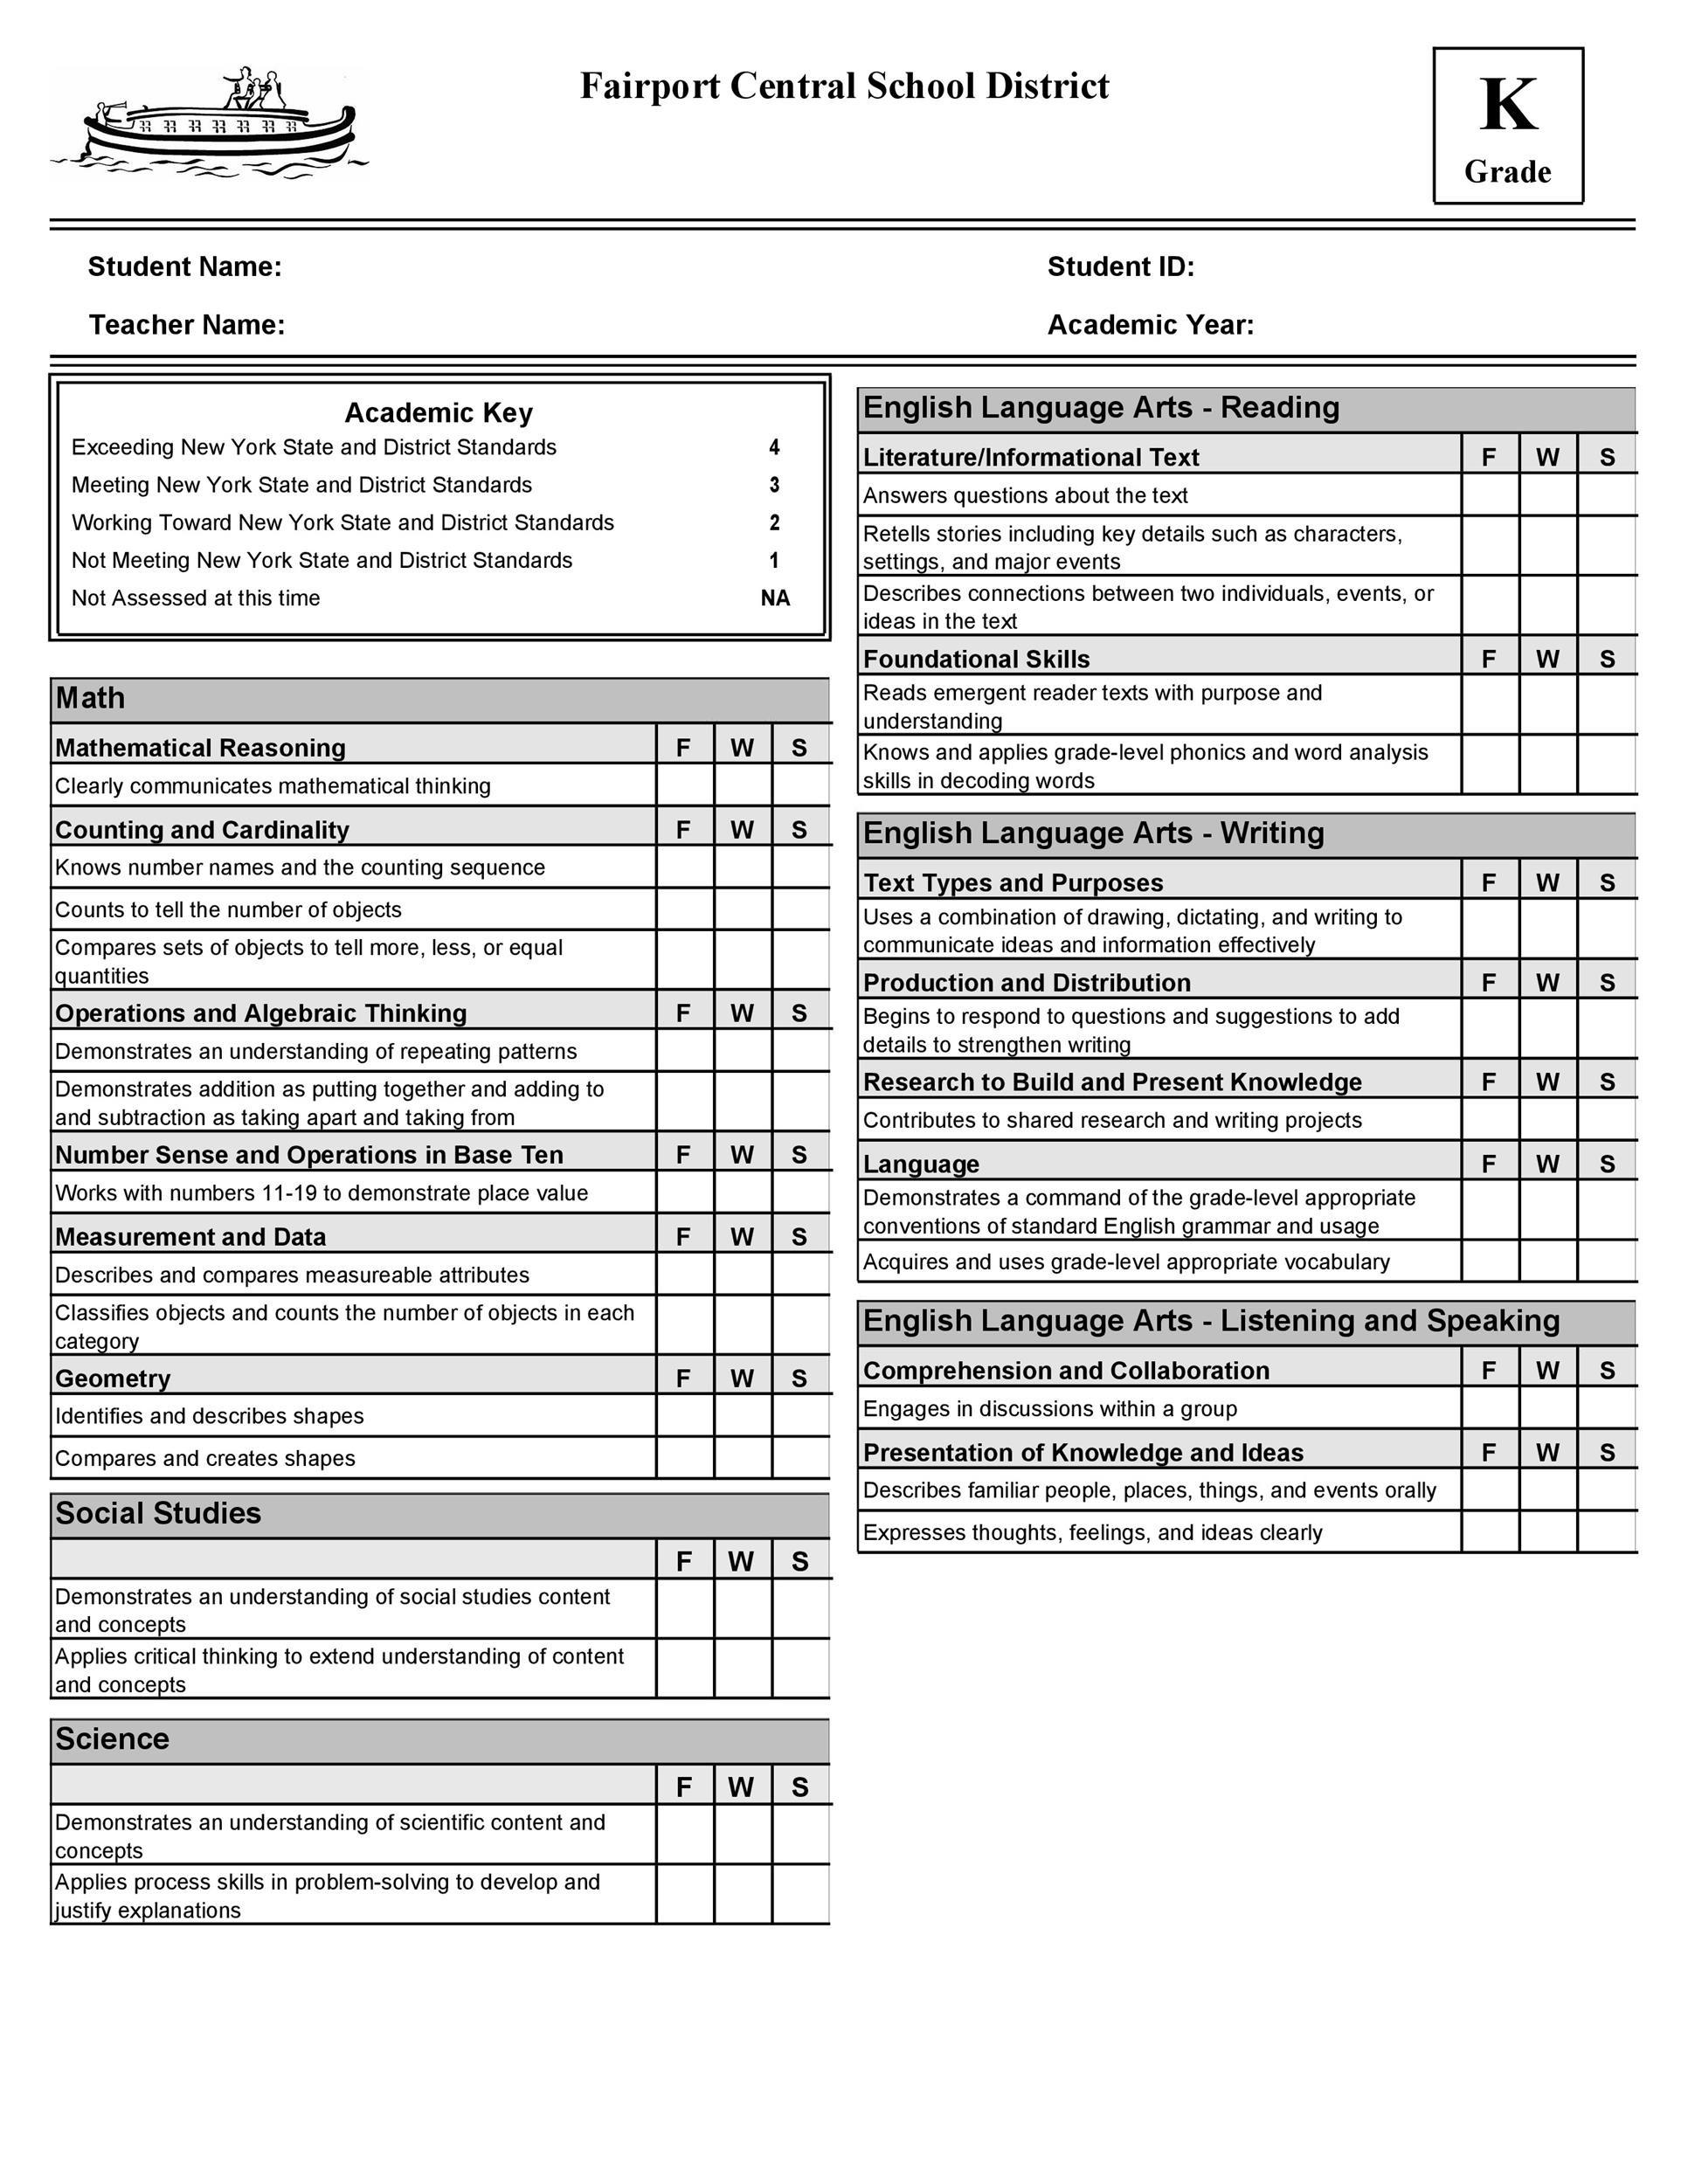 30+ Real  Fake Report Card Templates Homeschool, High School